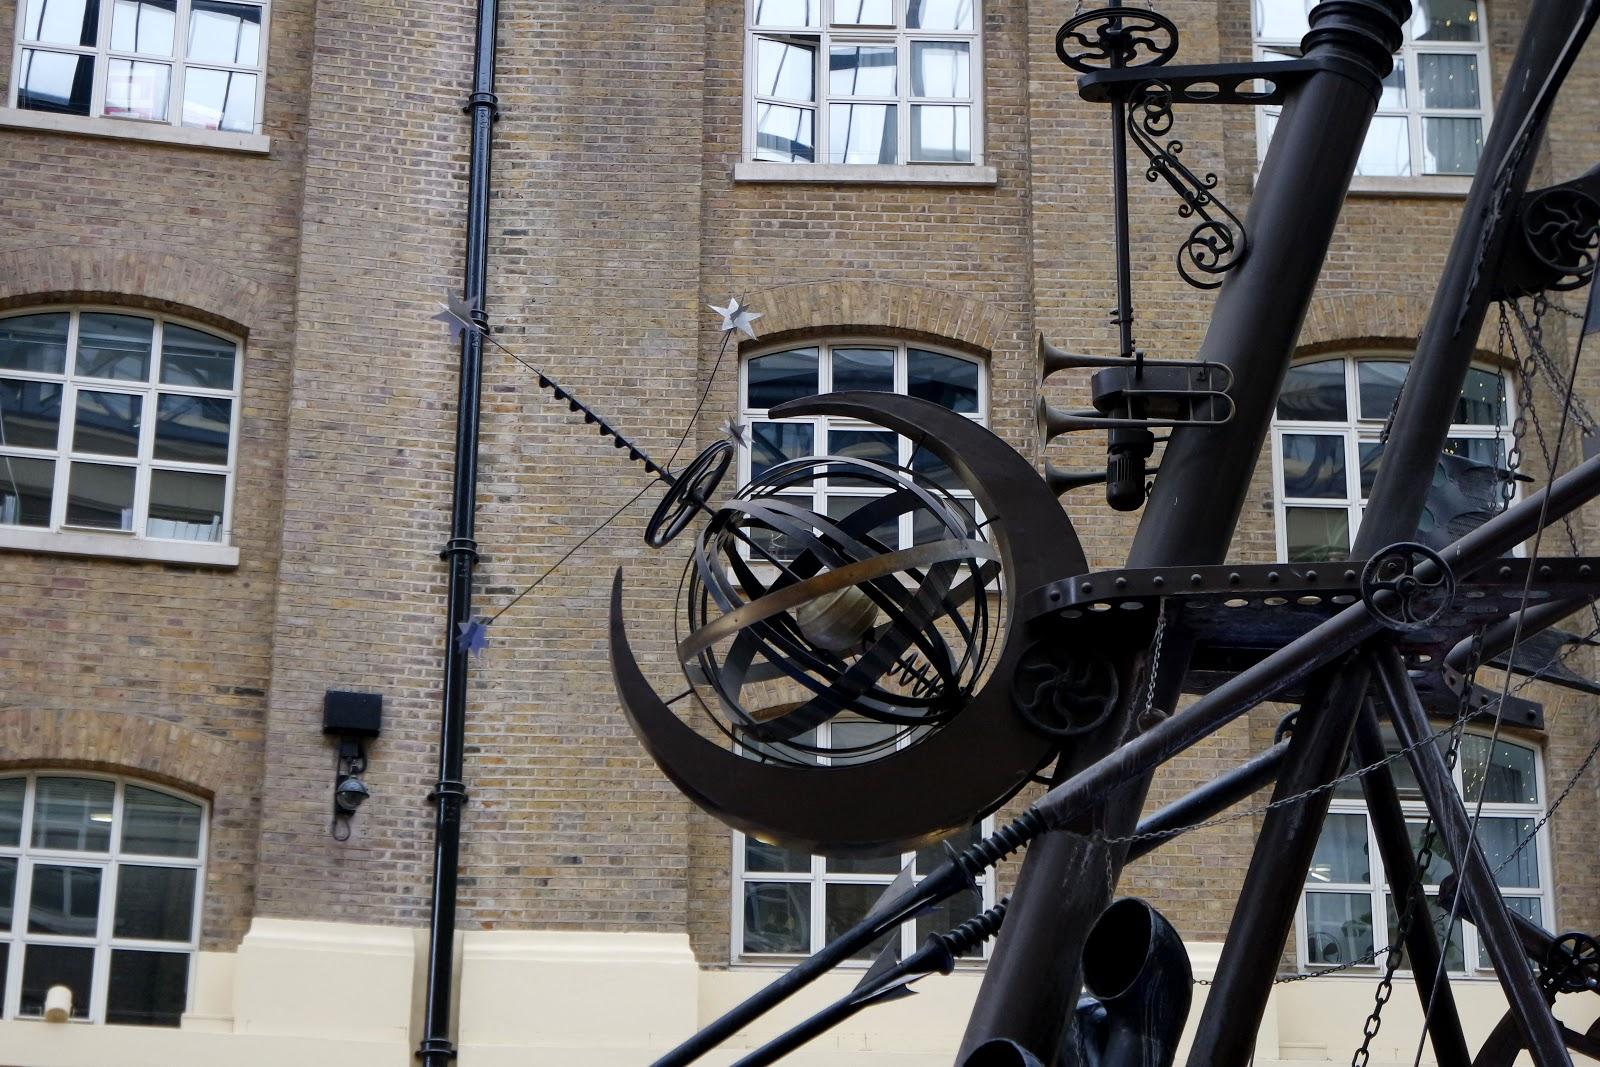 Battle Bridge Lane, London, blog, Londres, City of London, London street, Thames River, Tamise,